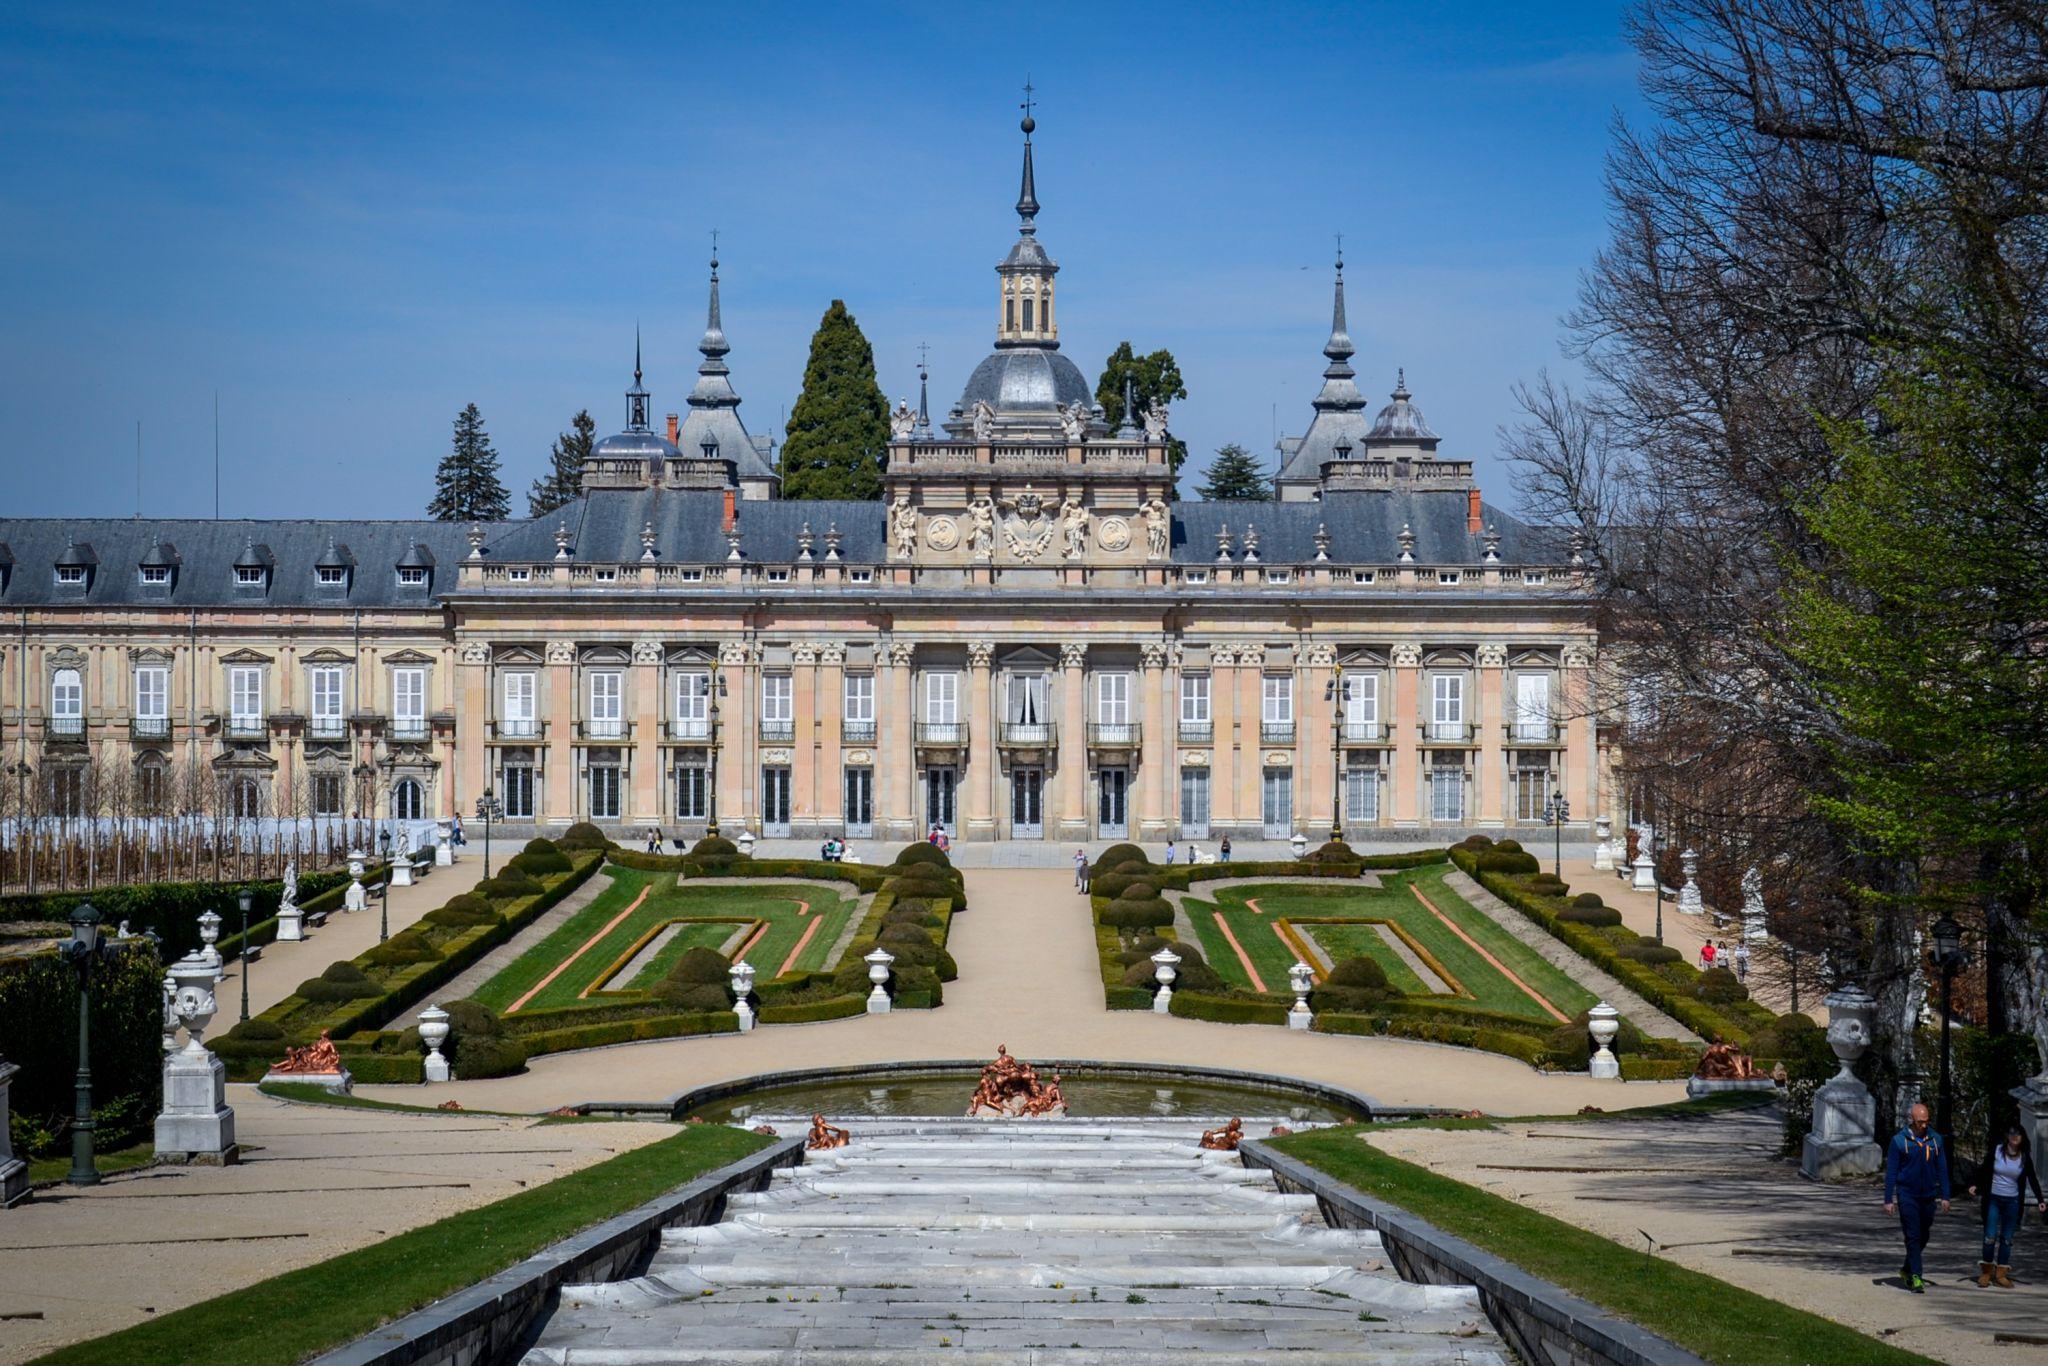 La Granja de San Ildefonso Royal Palace, Spain